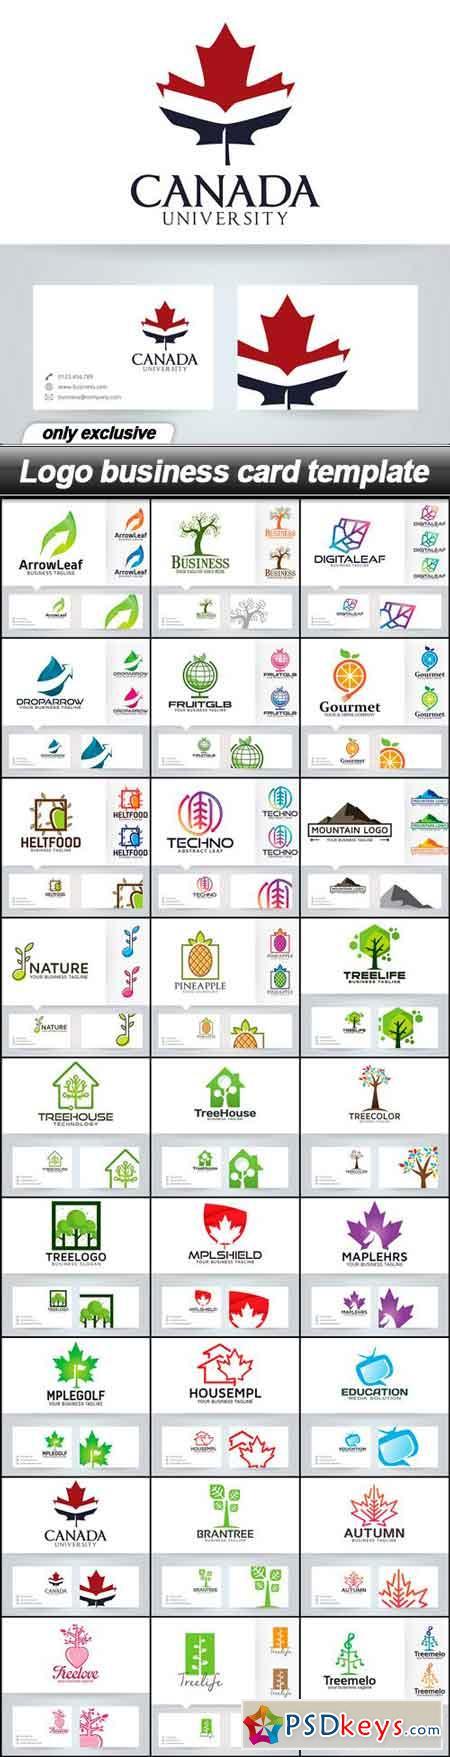 Logo business card template - 27 EPS